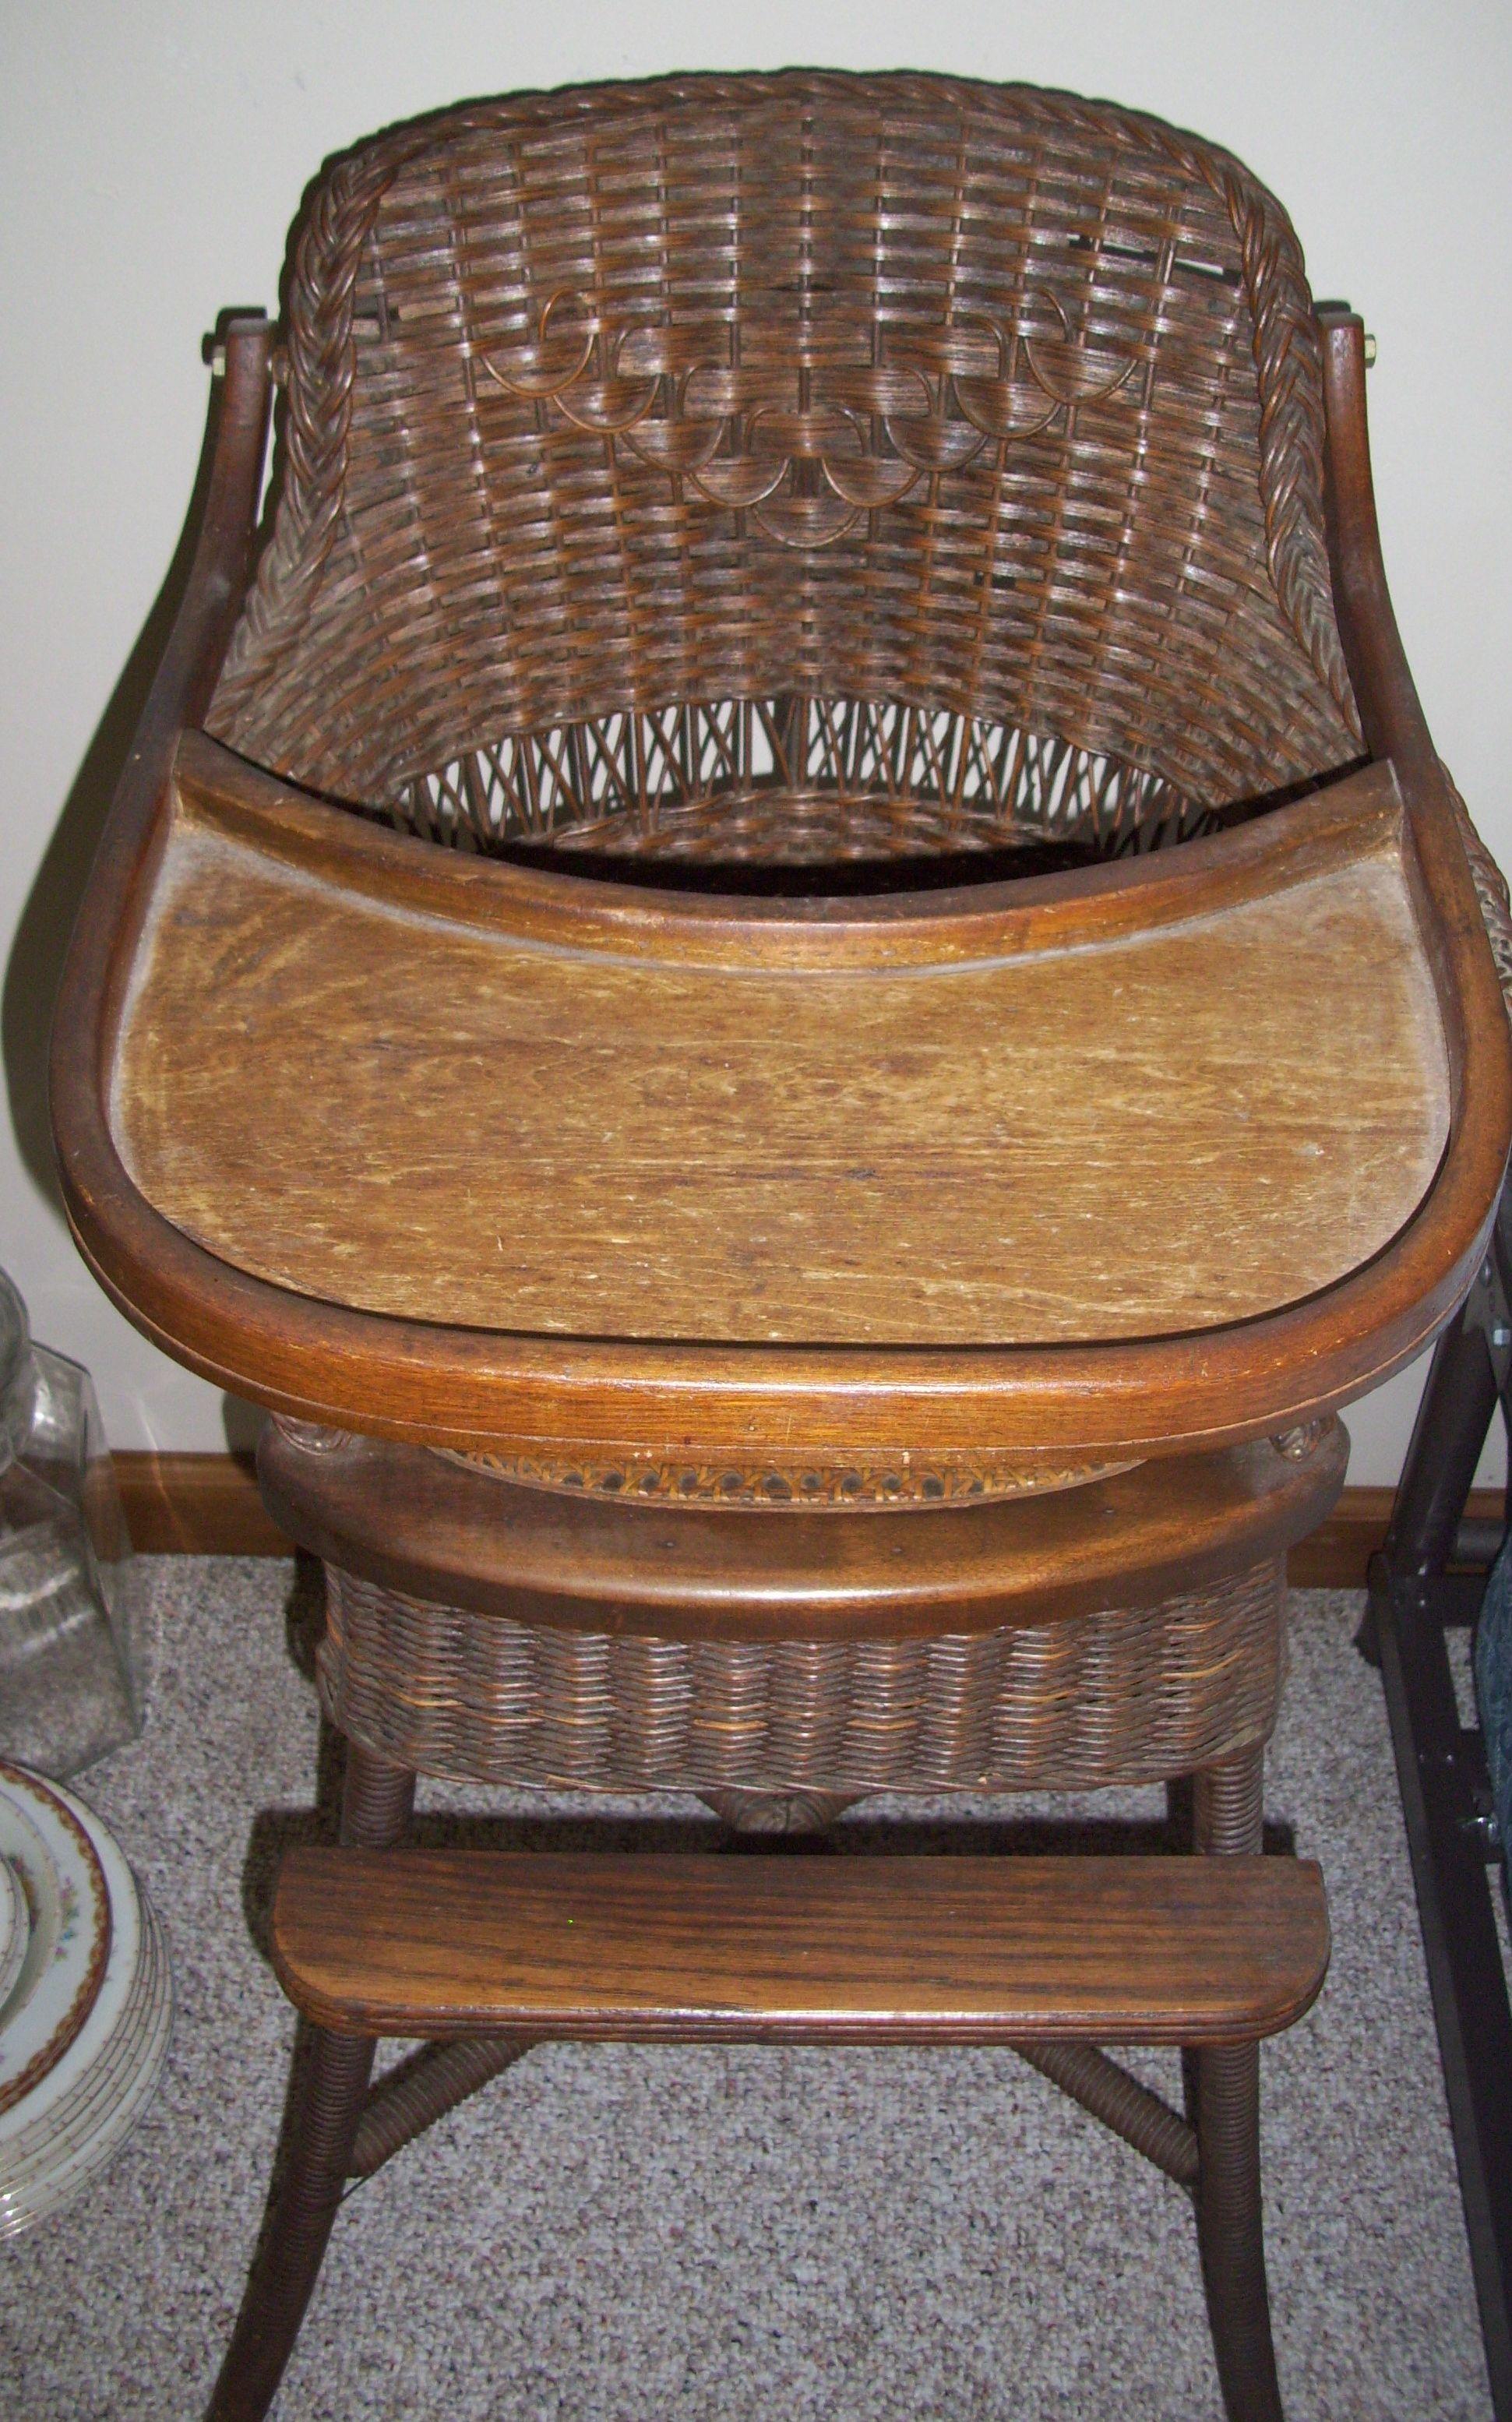 Antique Wicker High Chair